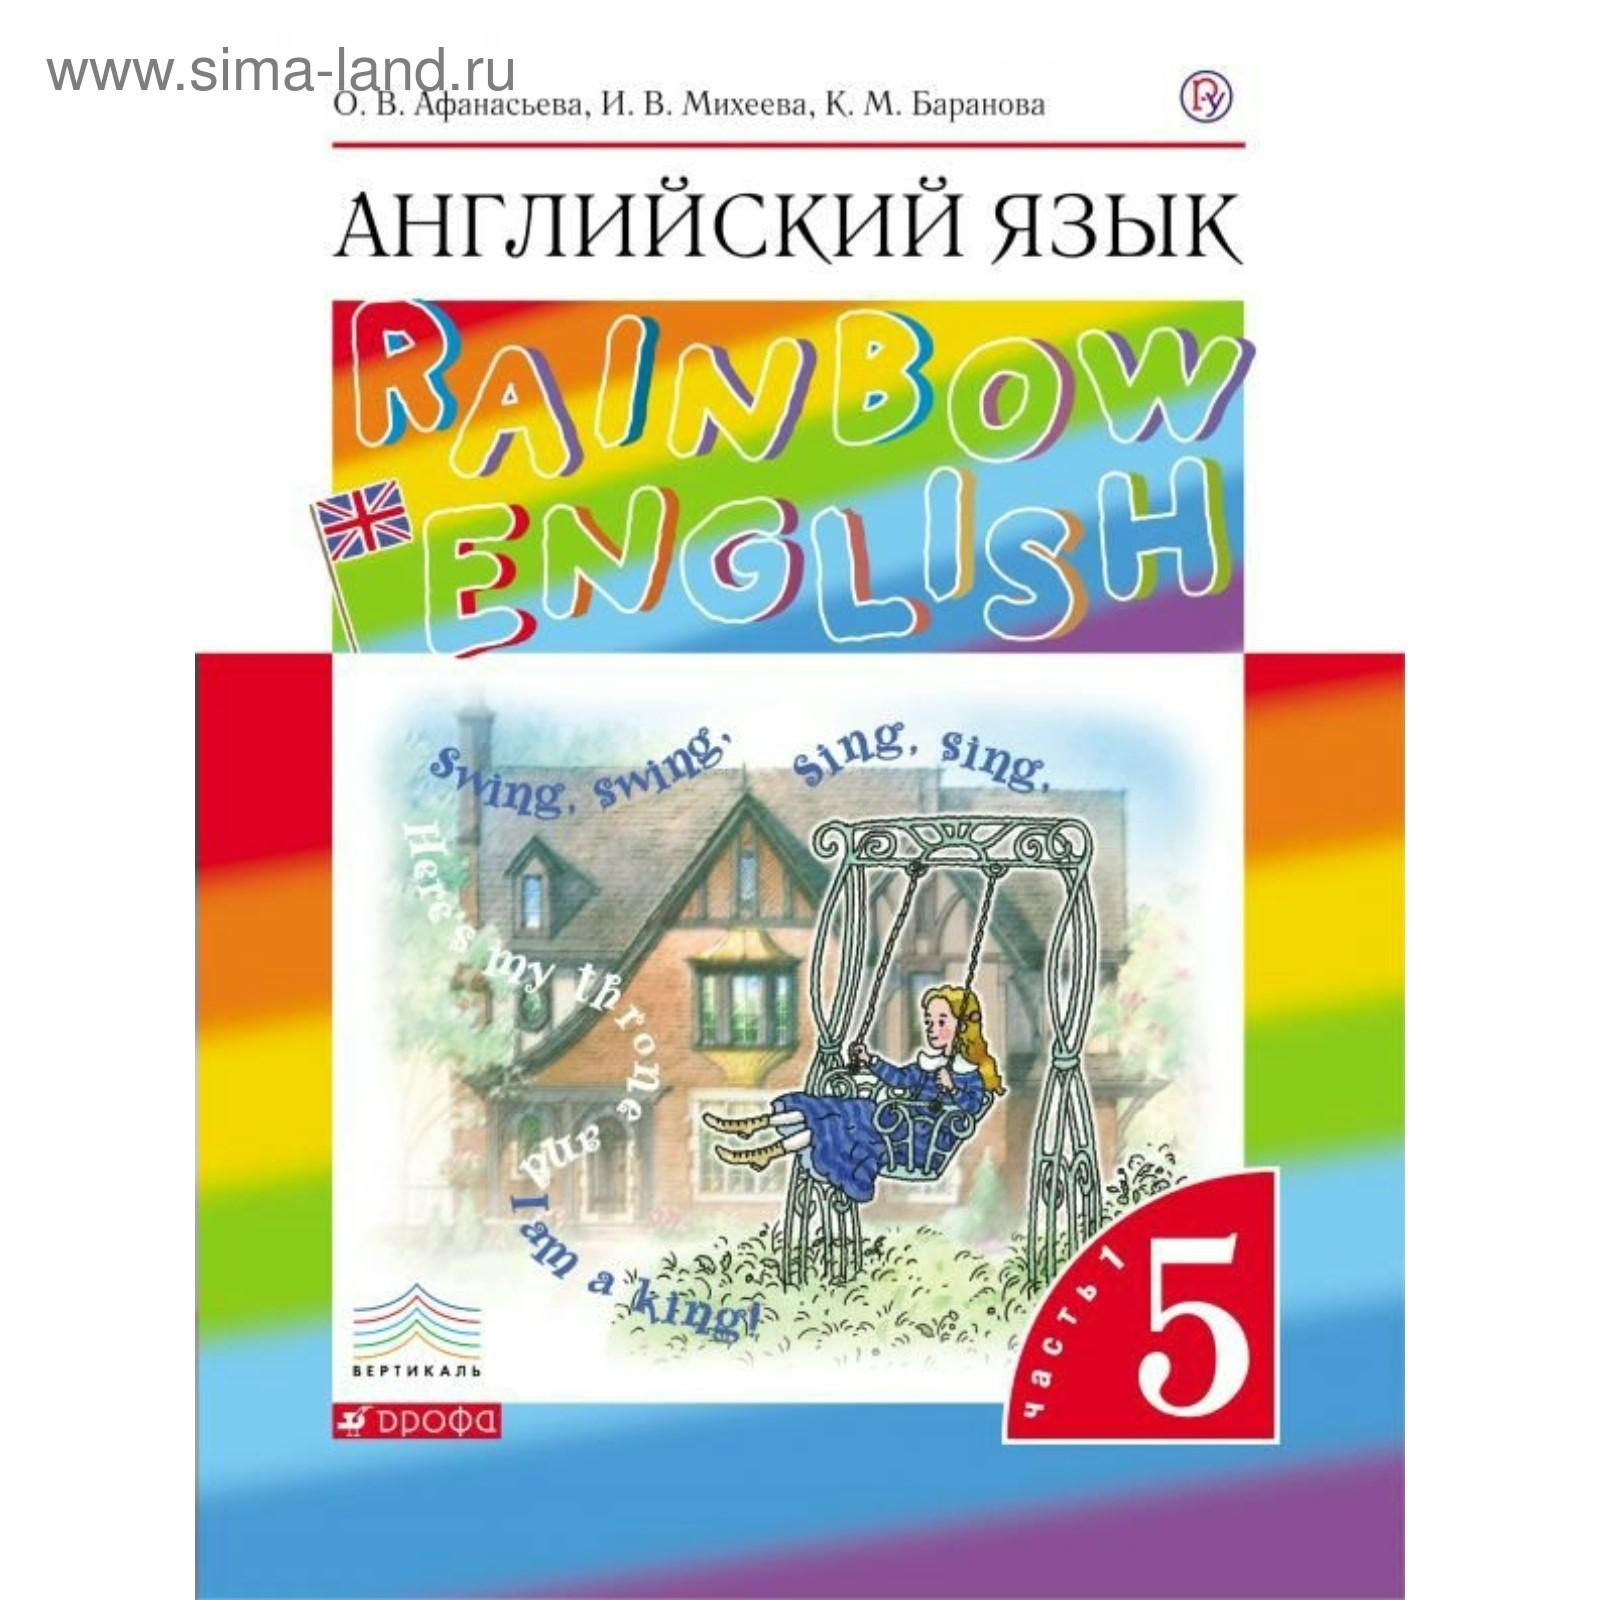 английский язык 1 час цена